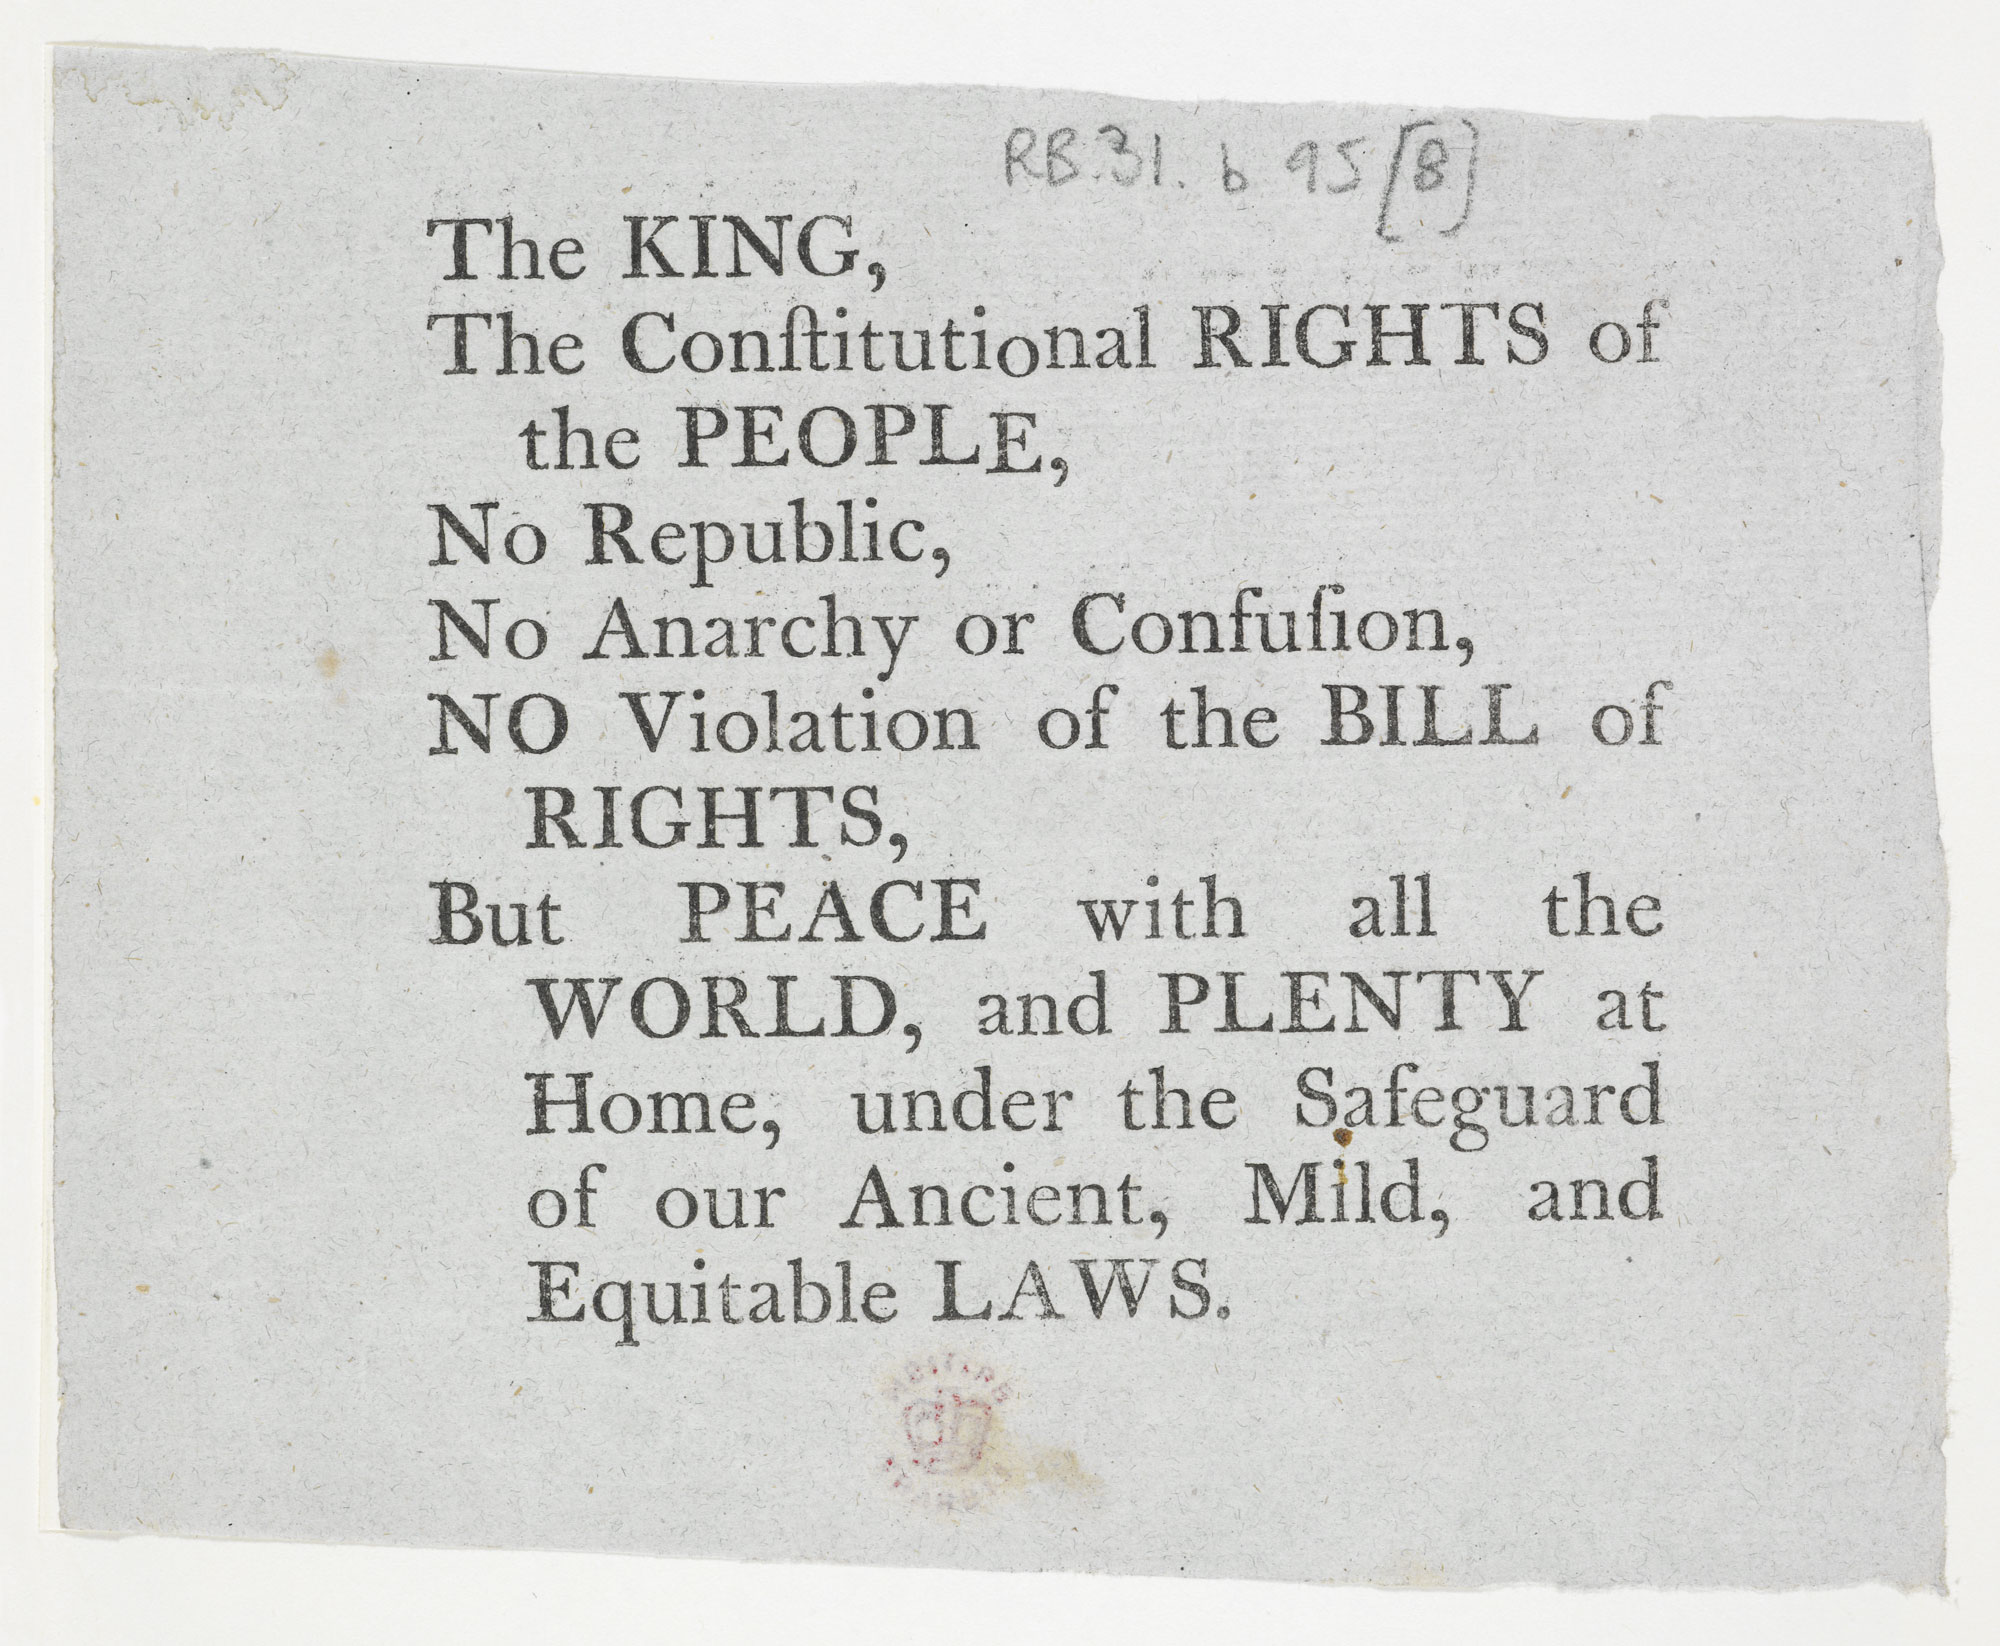 An anti-Revolution handbill declaring allegiance to the King [page: single sheet]